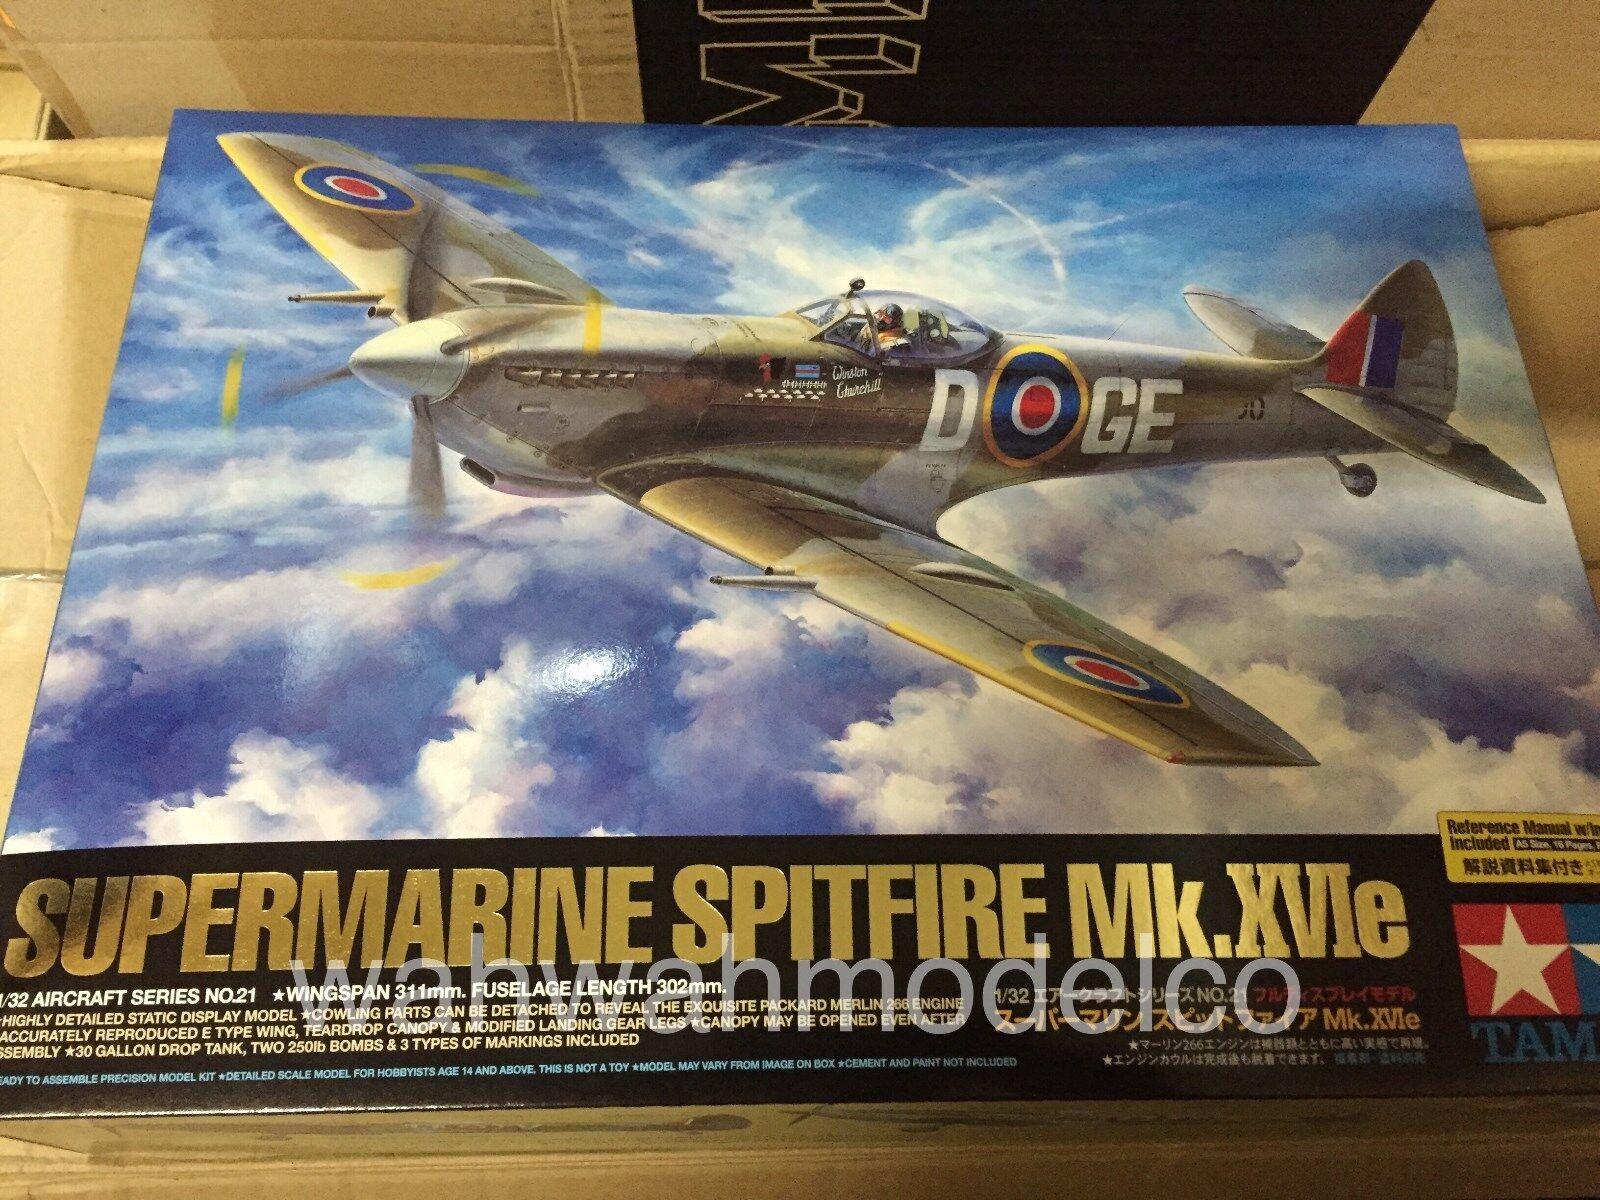 Tamiya Aircraft Model 1 32 Airplane Supermarine Spitfire Mk XVIe Hobby 60321